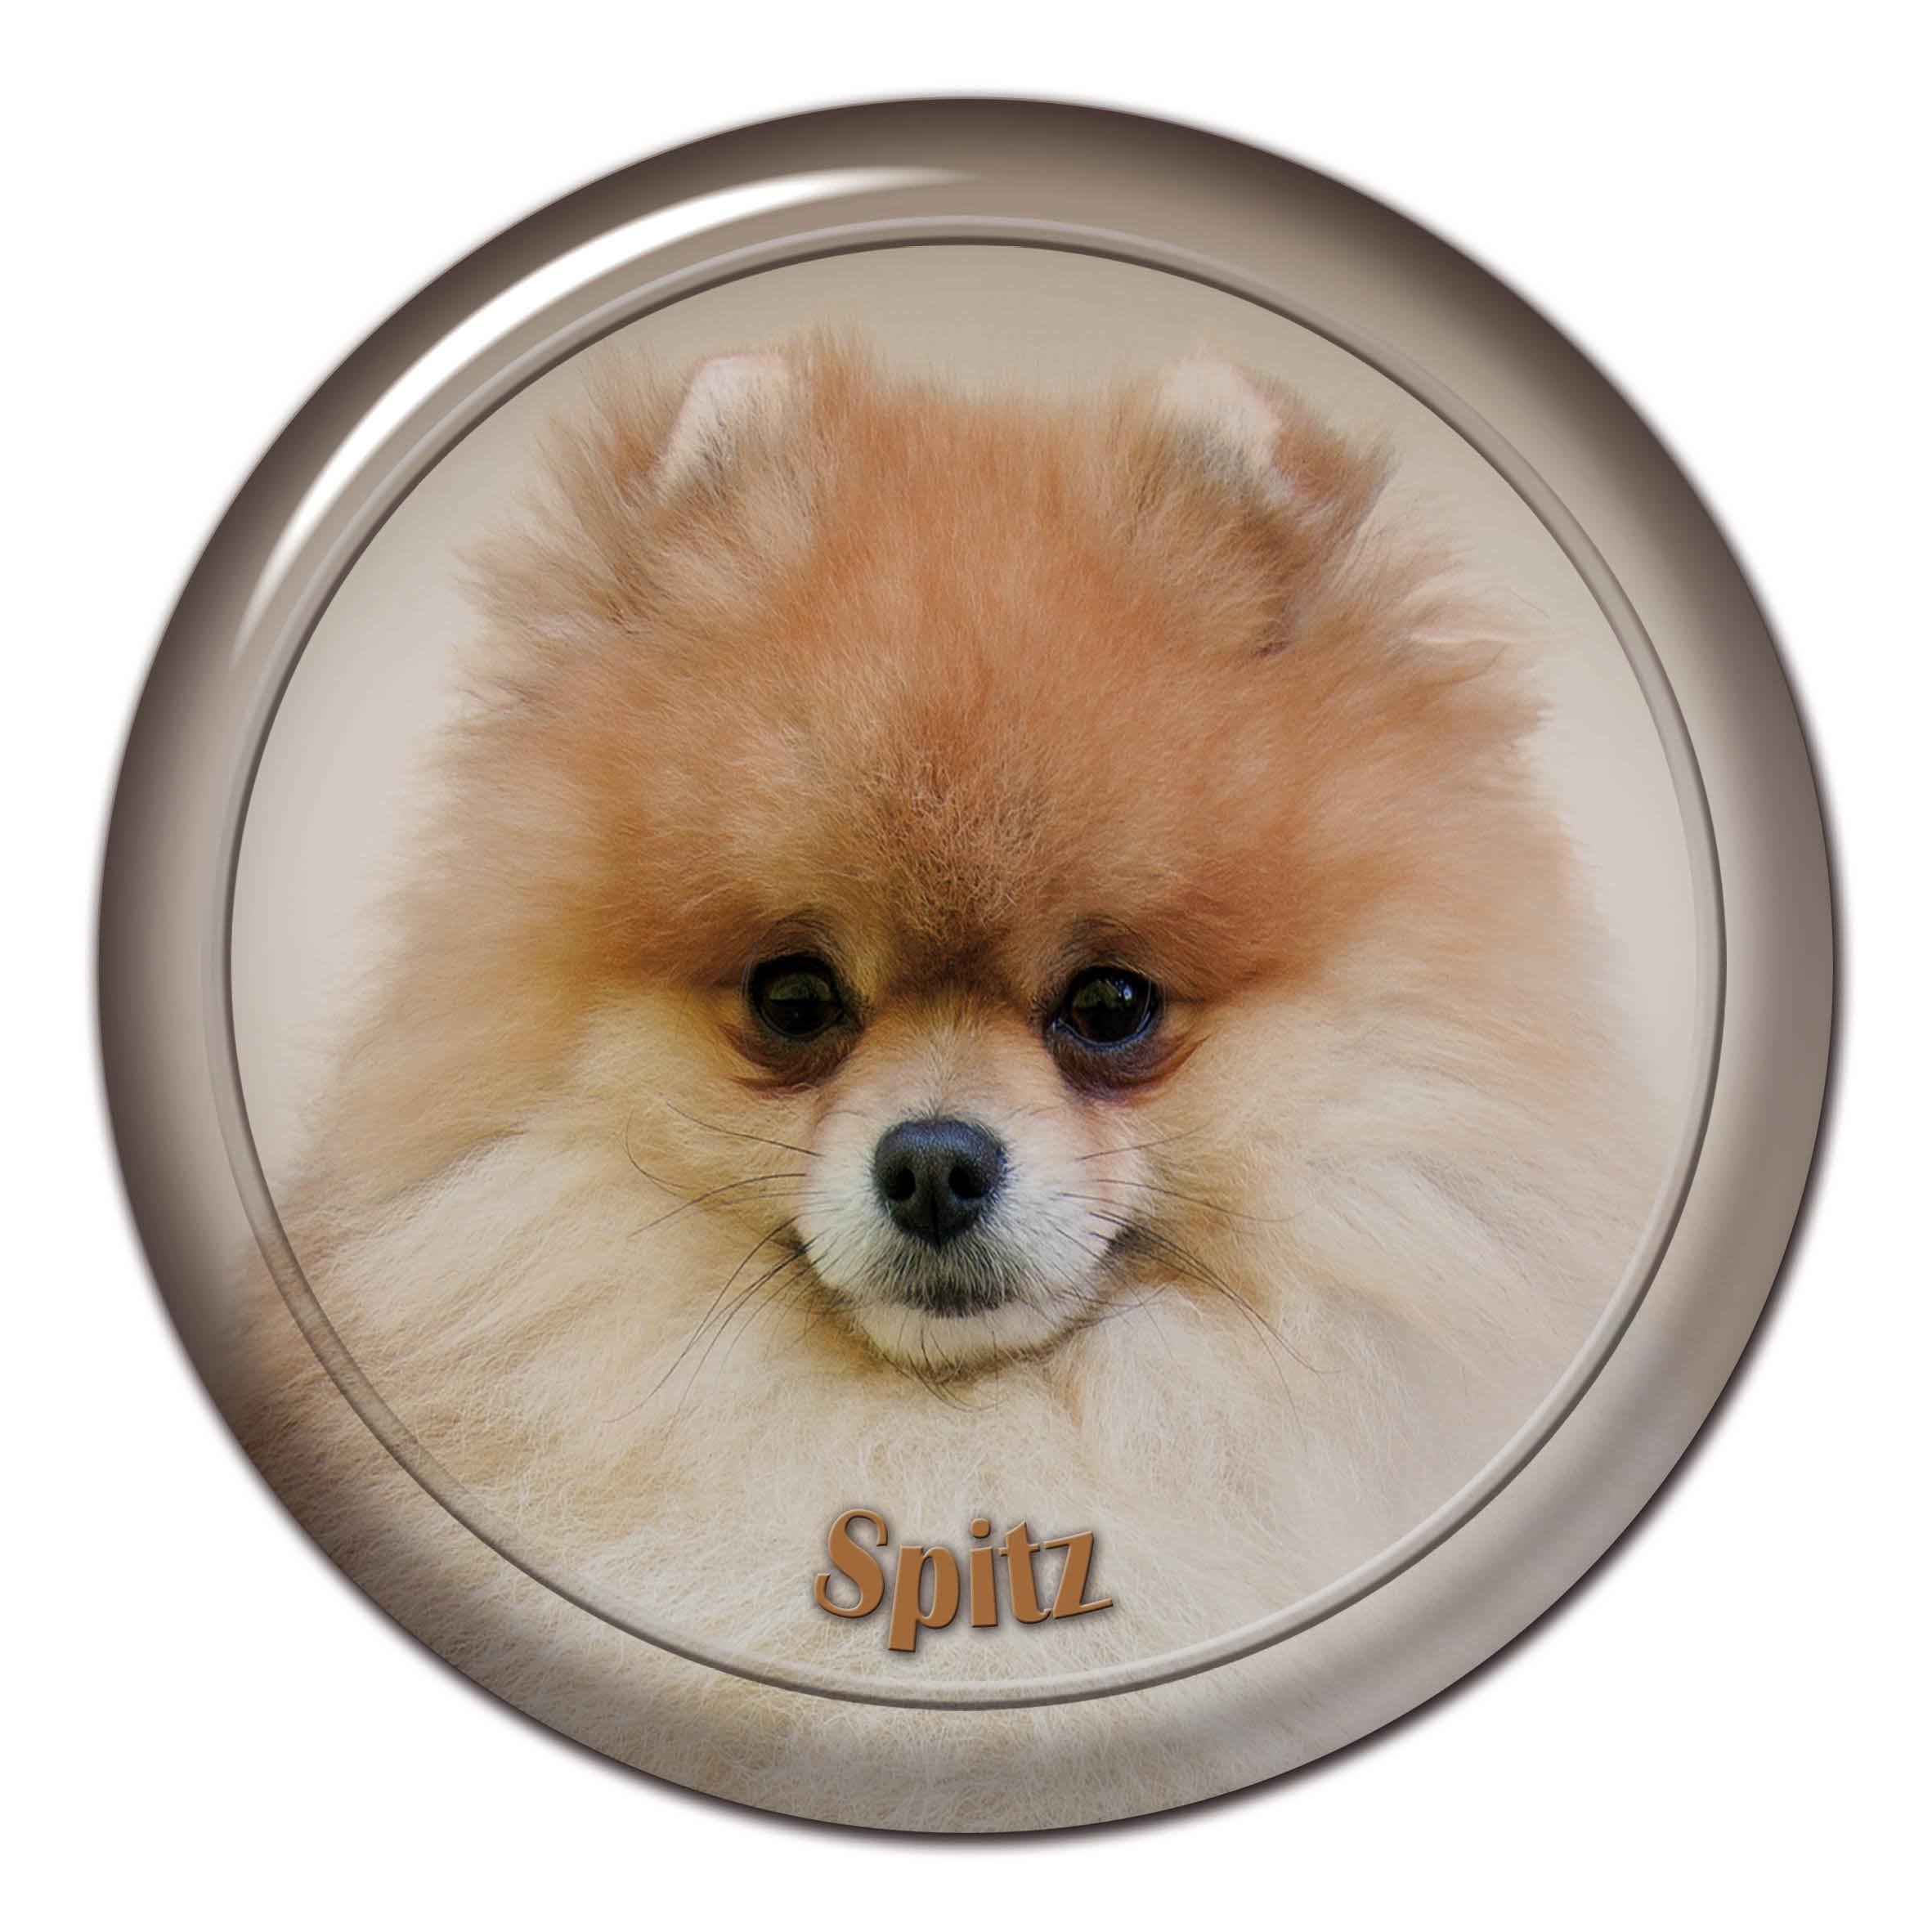 3d Sticker Spitz 101 C From Alldogstickerscom Dog Breed Stickers